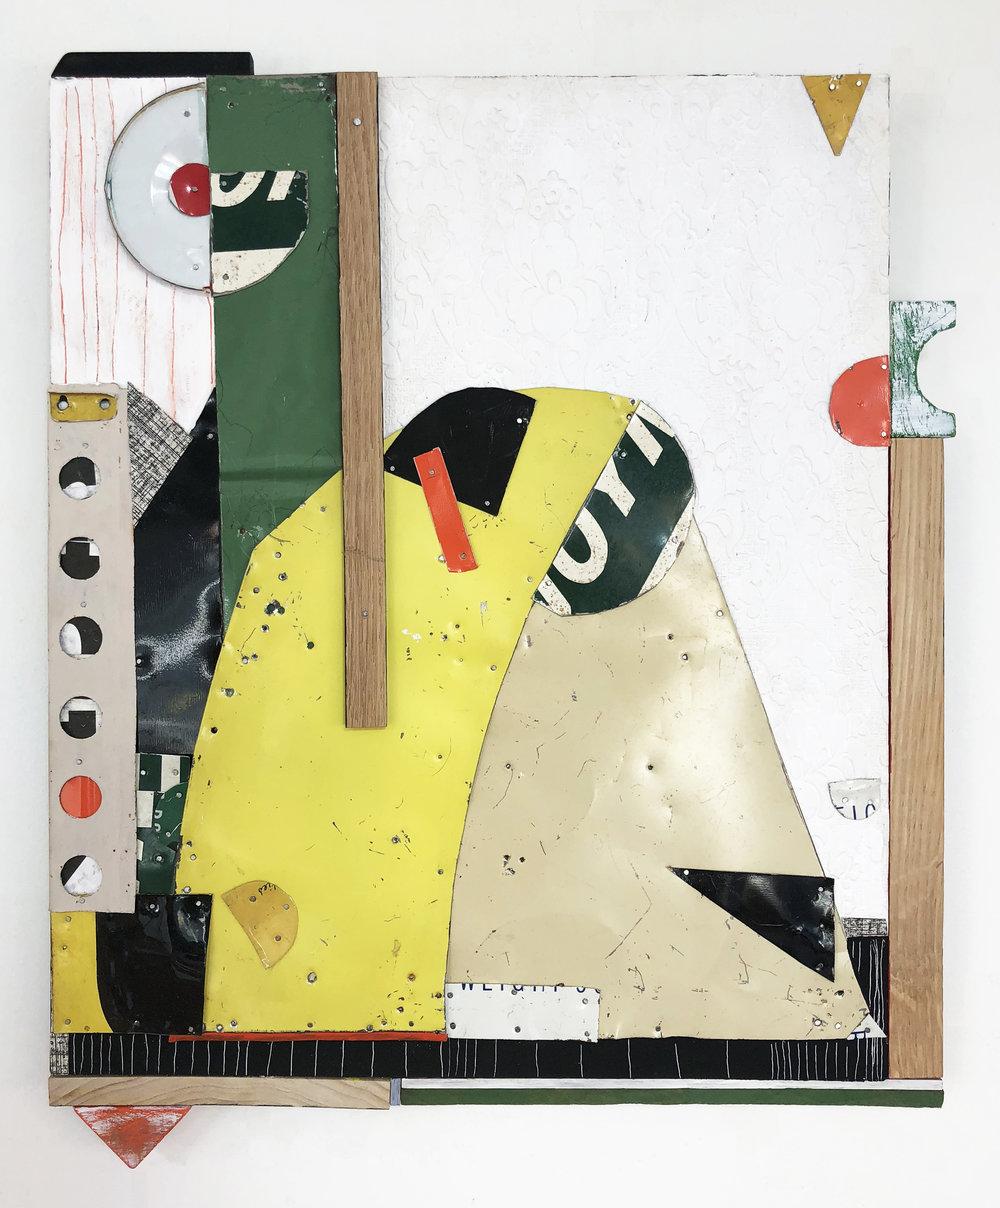 Running Uphill,  2018, Acrylic, Flashe Vinyl, Tin, Nails, Wallpaper, Wood, Collage on Panel